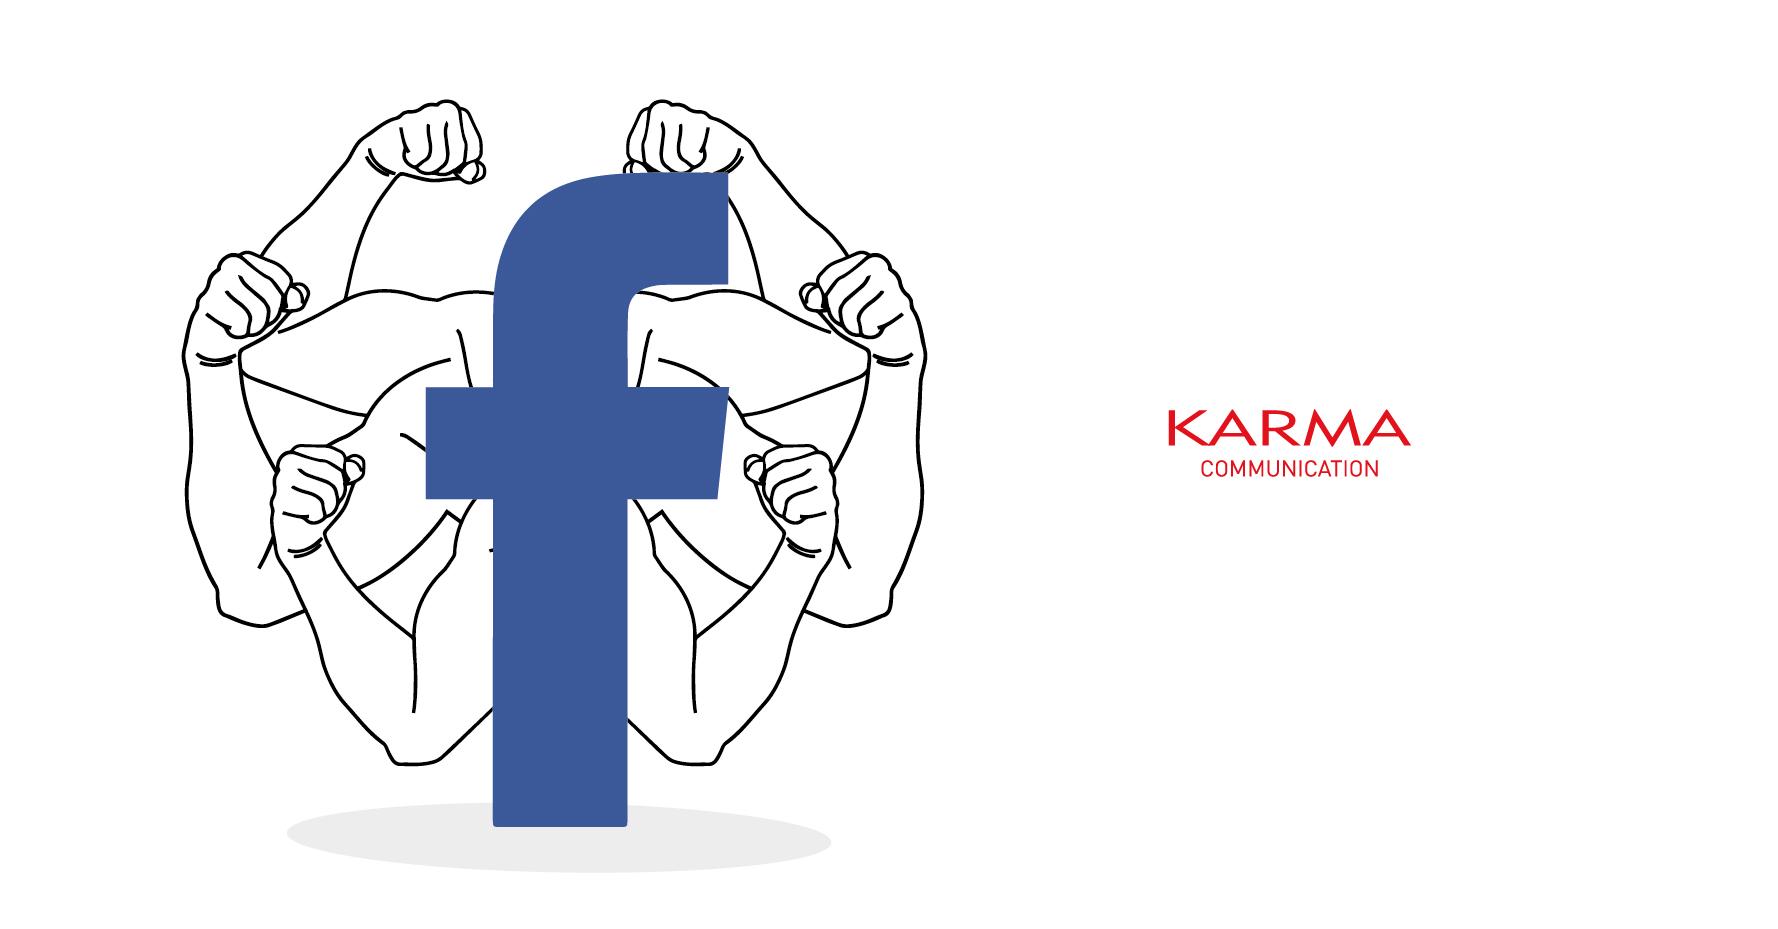 Karma Communication - Facebook che continua a stupirmi